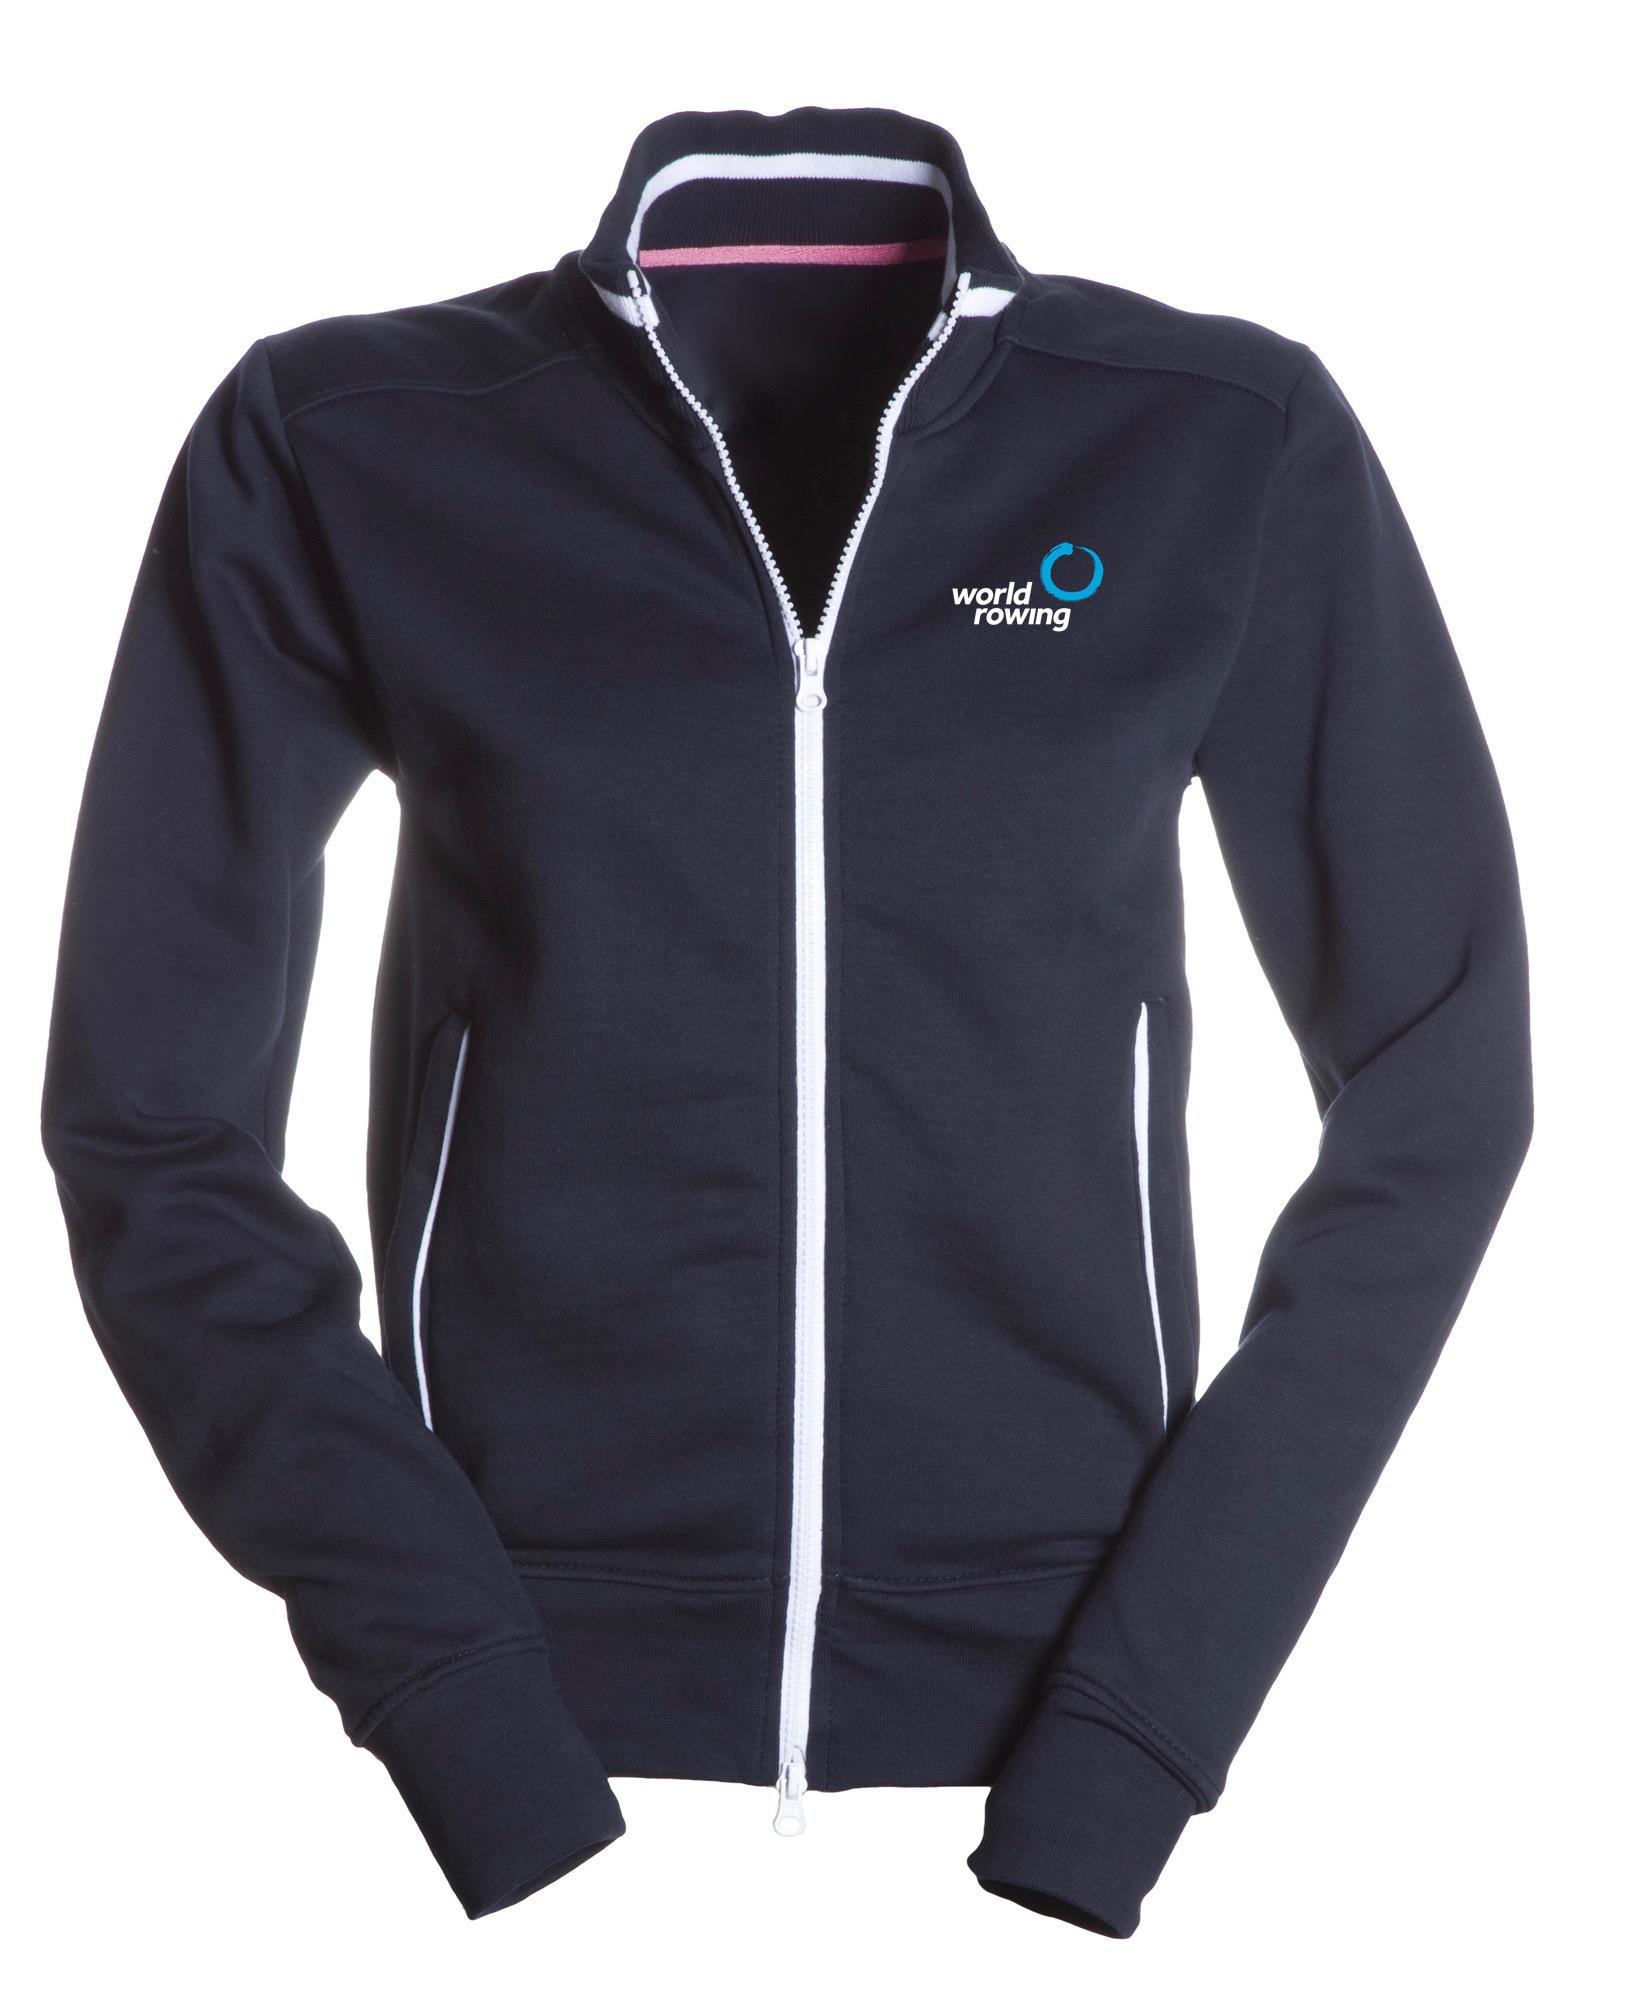 World Rowing Old School Jacket Lady - Navy, NW Logo Brust oben rechts, WR Logo 10cm Brust lins, WR Logo 25cm Rücken